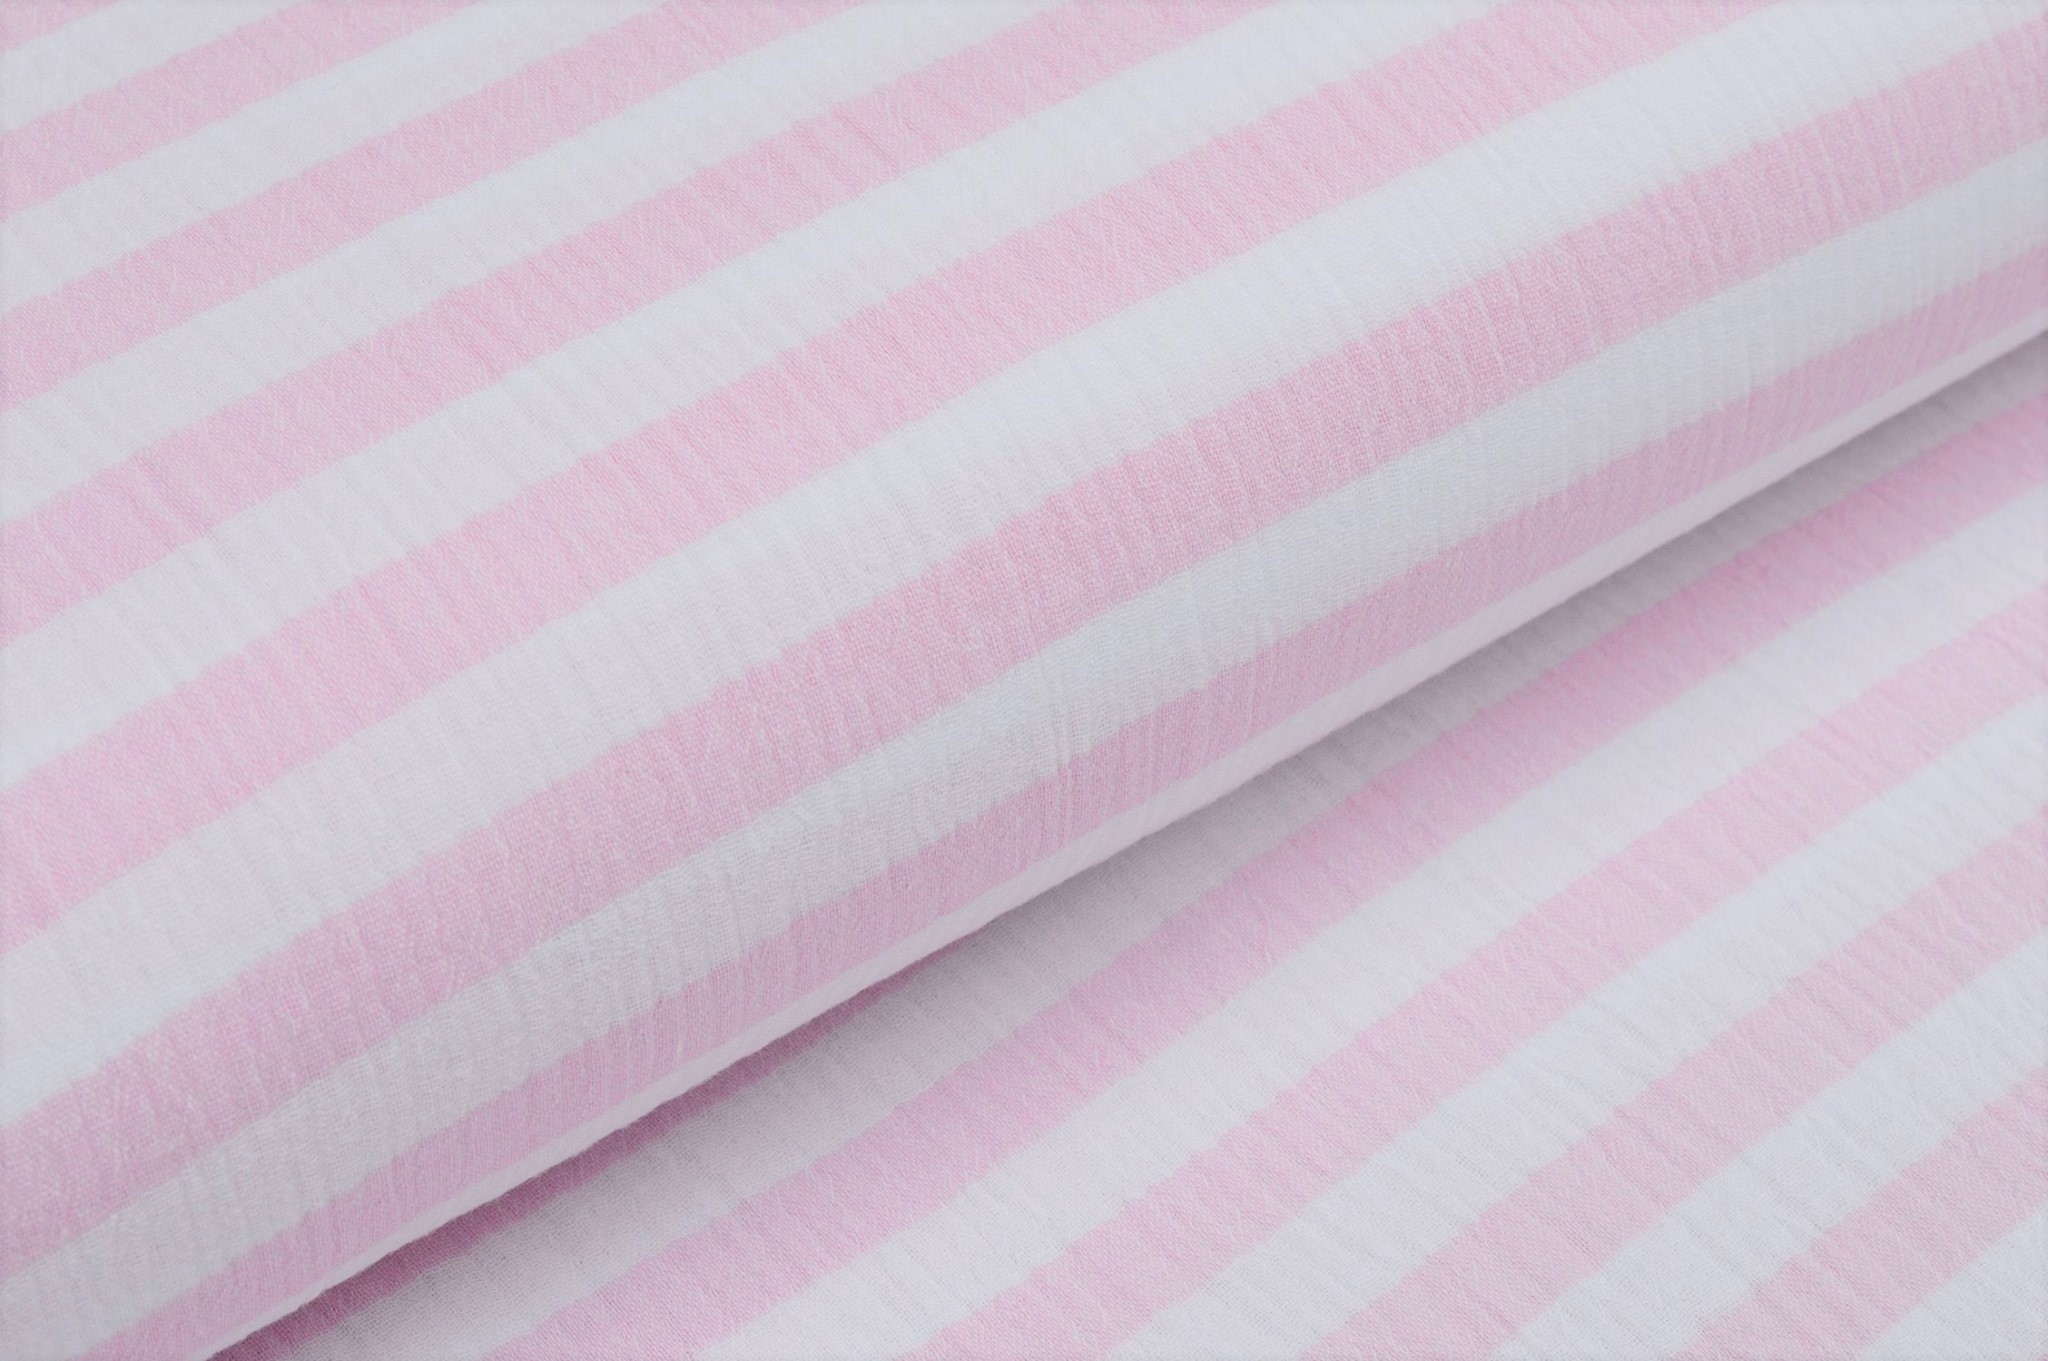 Baumwolle Musselin Double Gauze mit Streifen - ecru/rosa